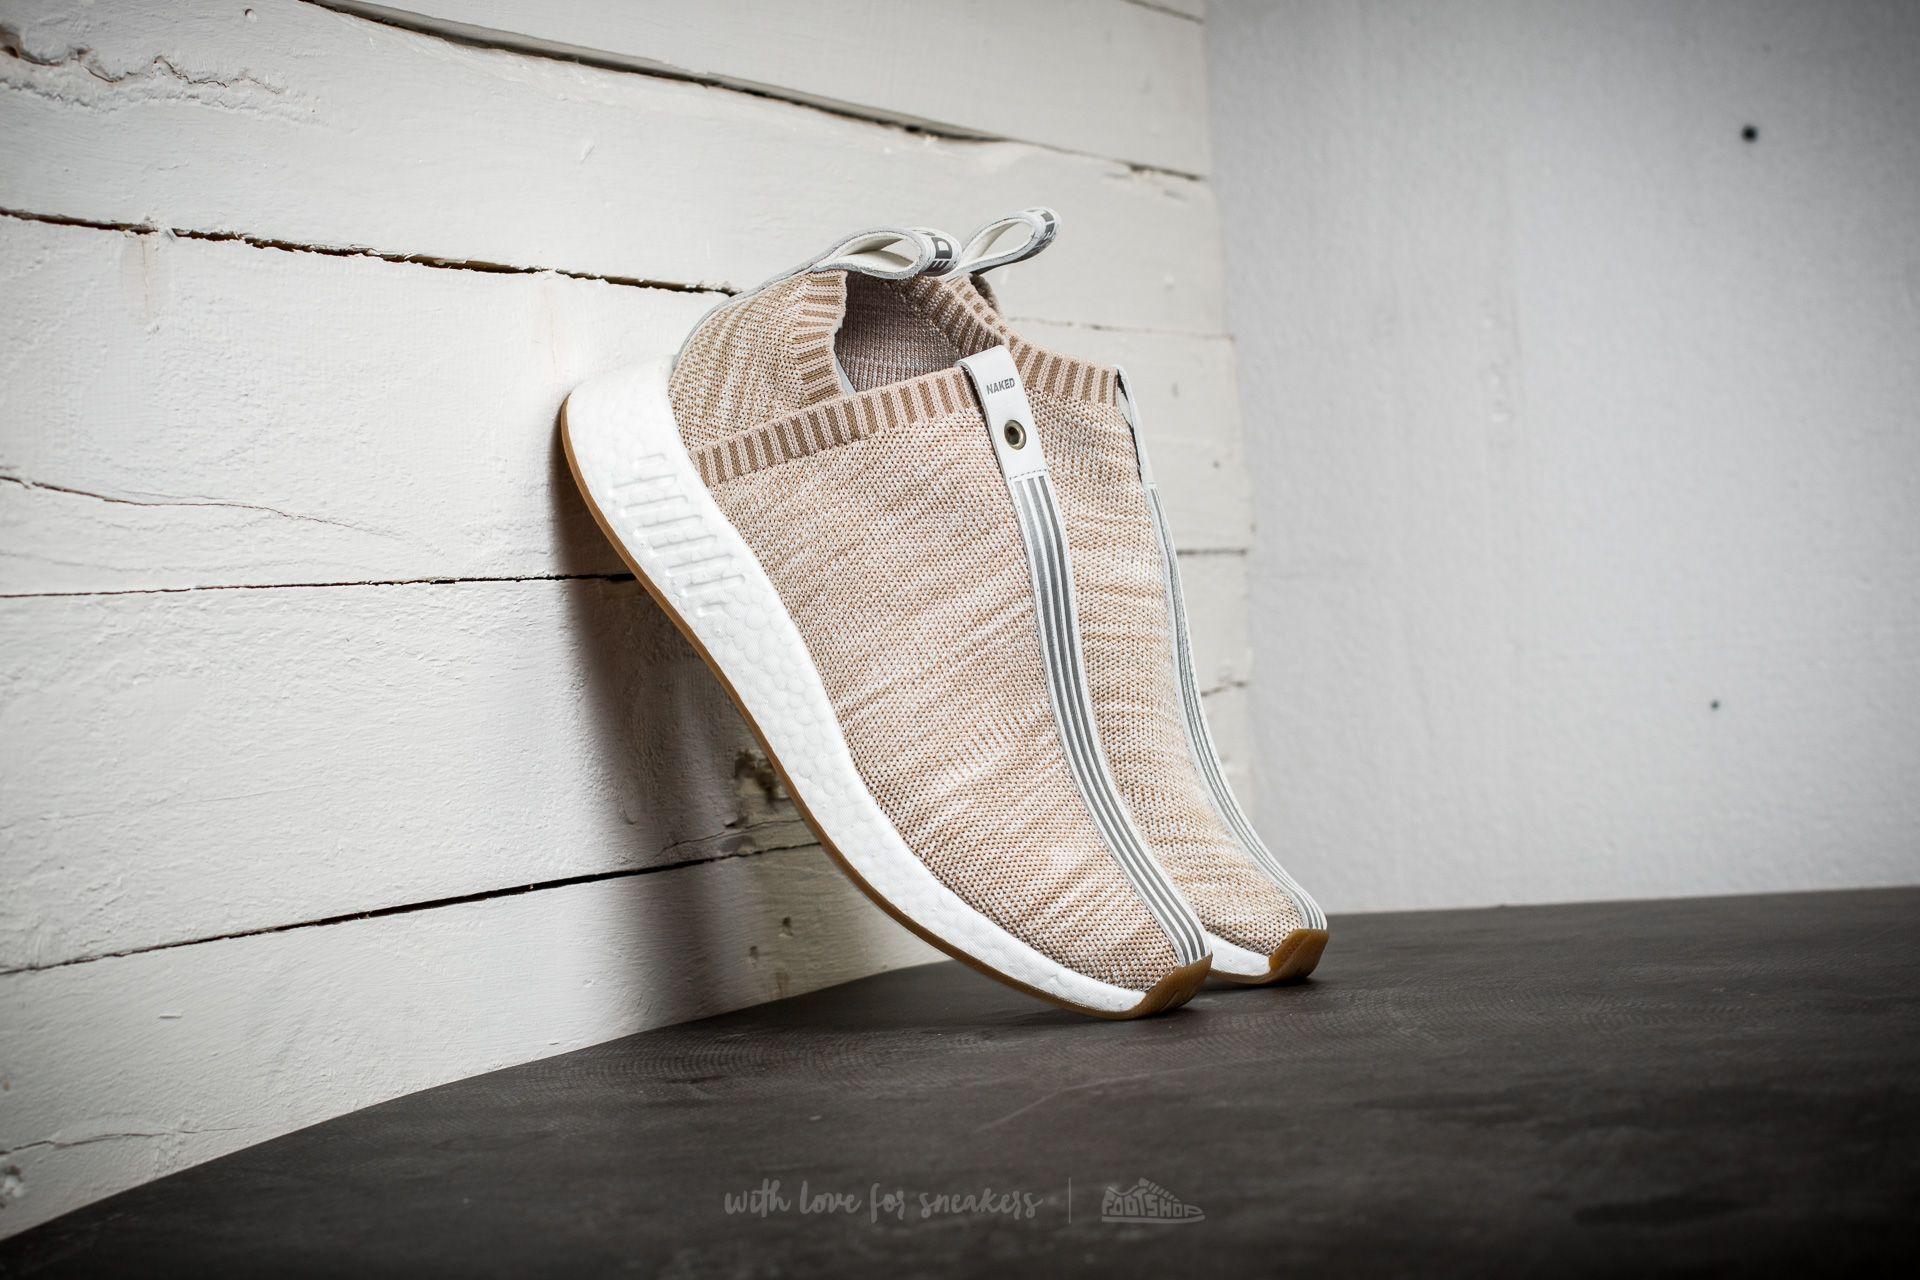 ecd4cc1cef4da adidas Consortium Sneaker Exchange NMD CS2 PK Kith x Naked. Sand  White